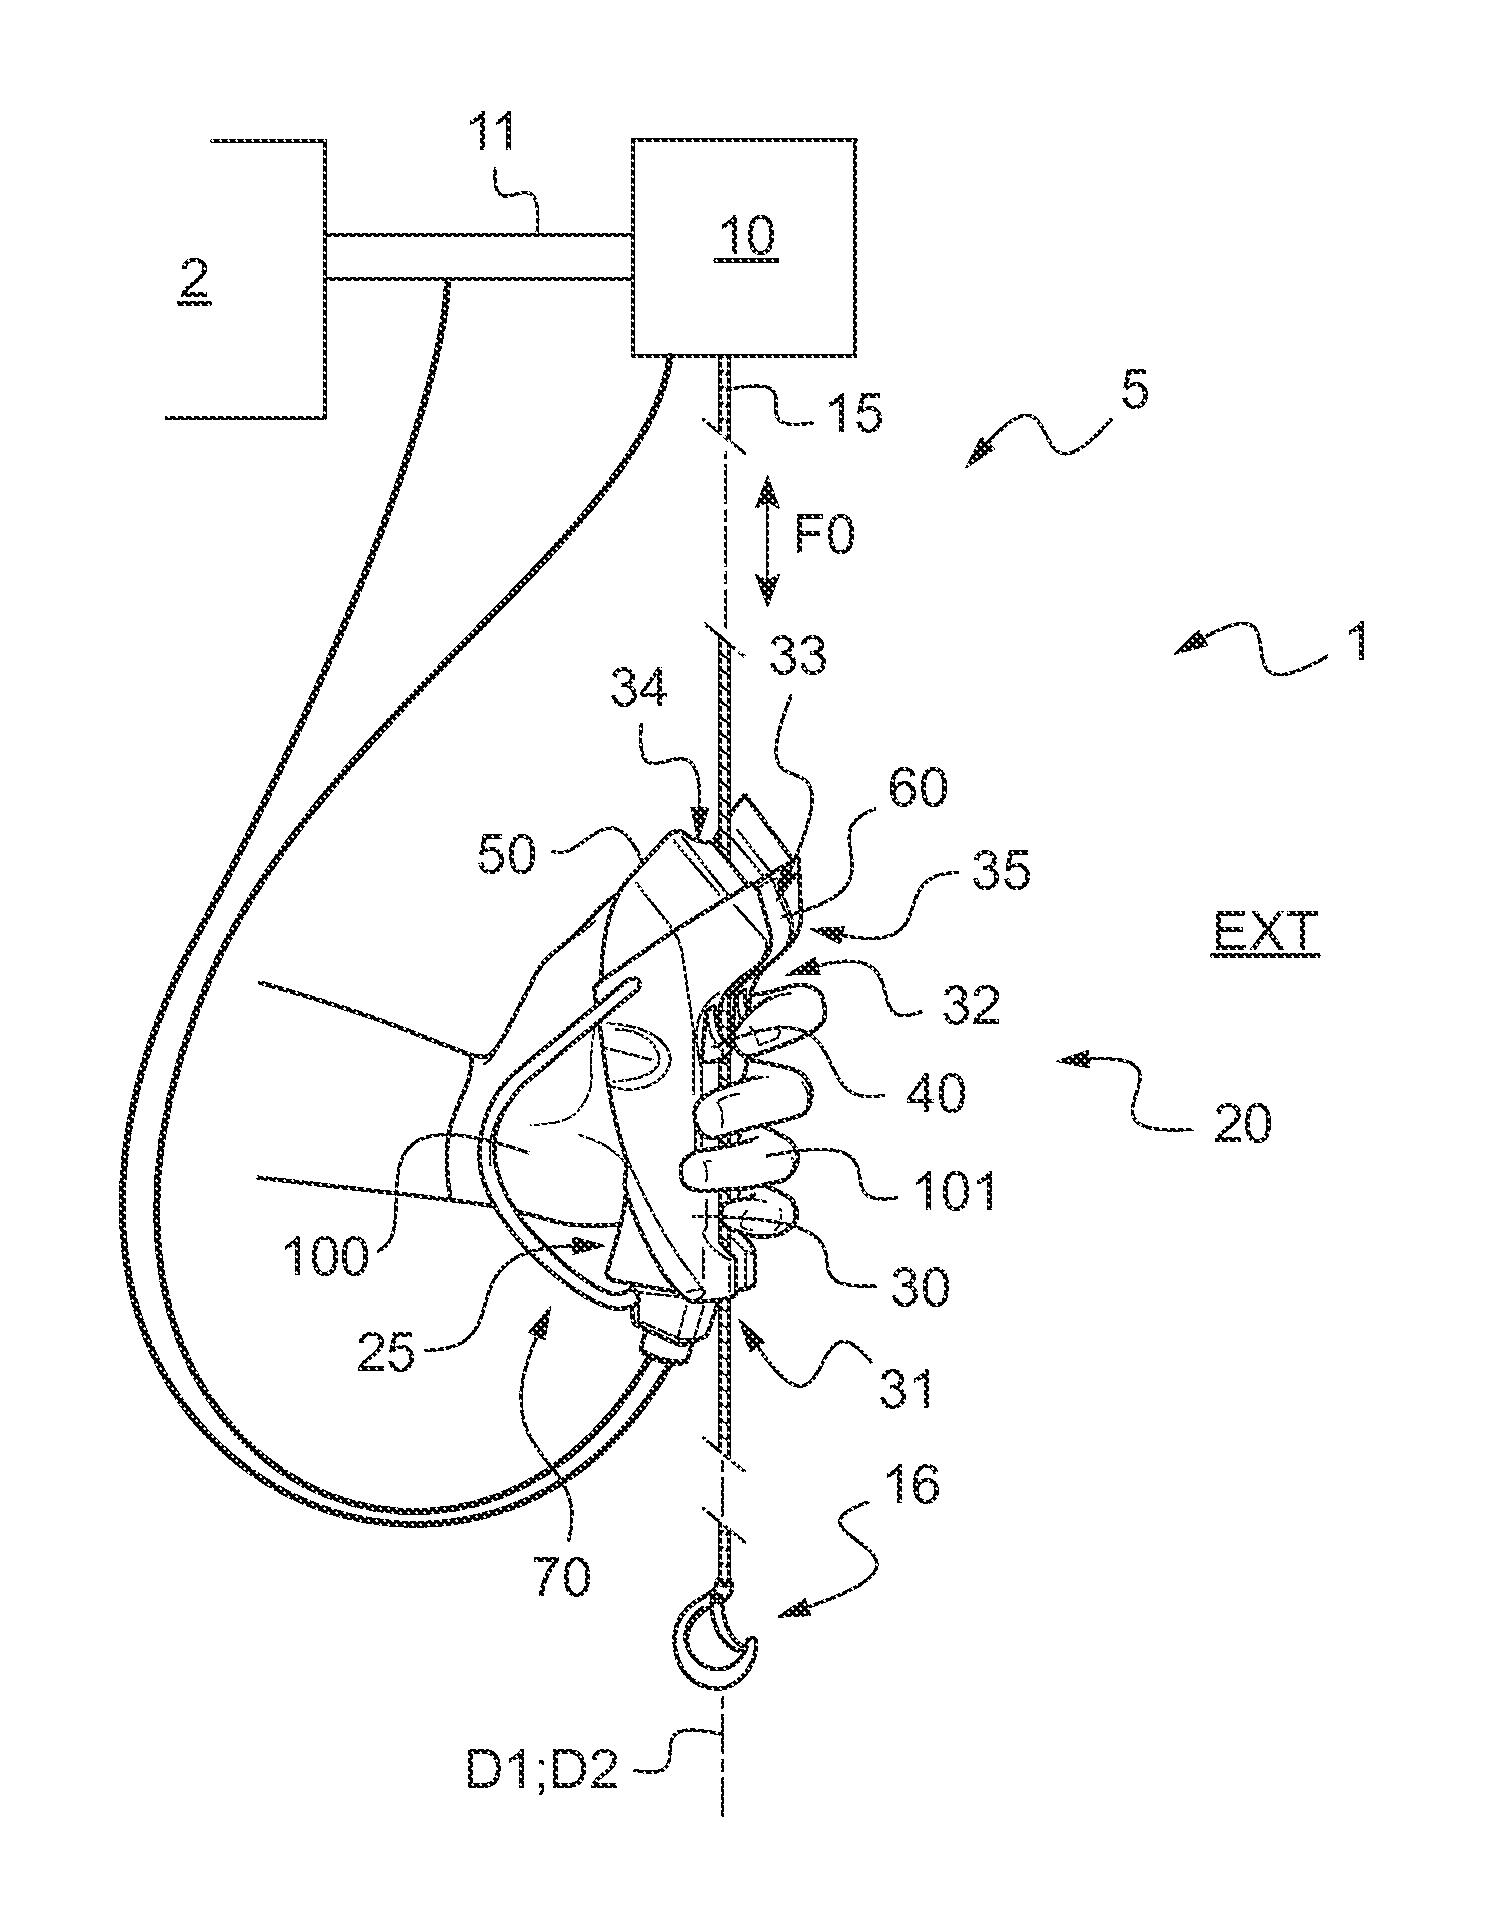 hight resolution of means for a lifter device hoist on overhead crane hoist ke diagram hoist control panel wiring diagram electric